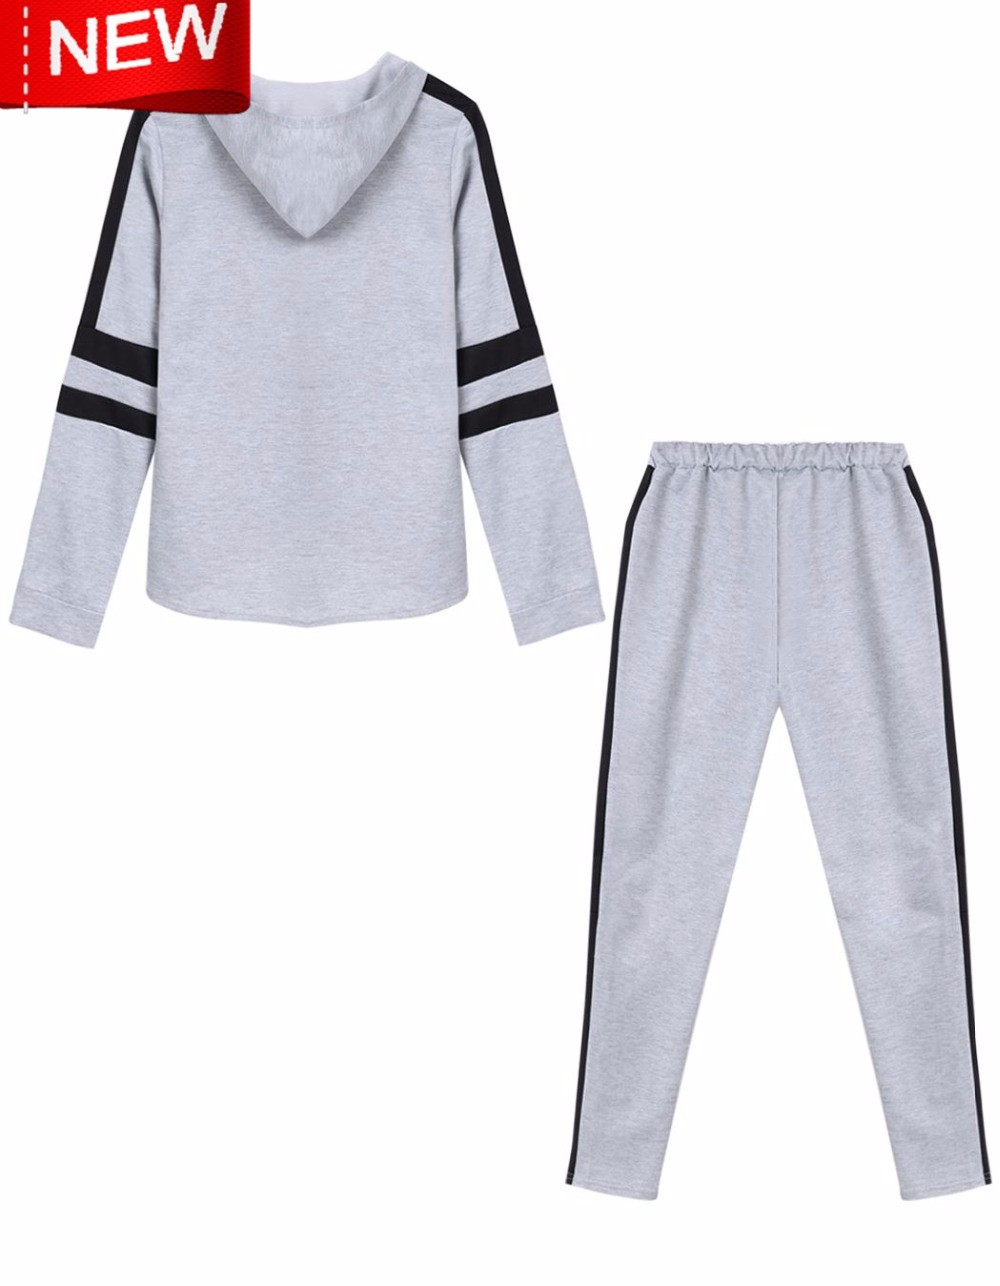 Womens Ladies Camouflage Army Loungewear Set Sweatshirt Joggers Tracksuit Pants